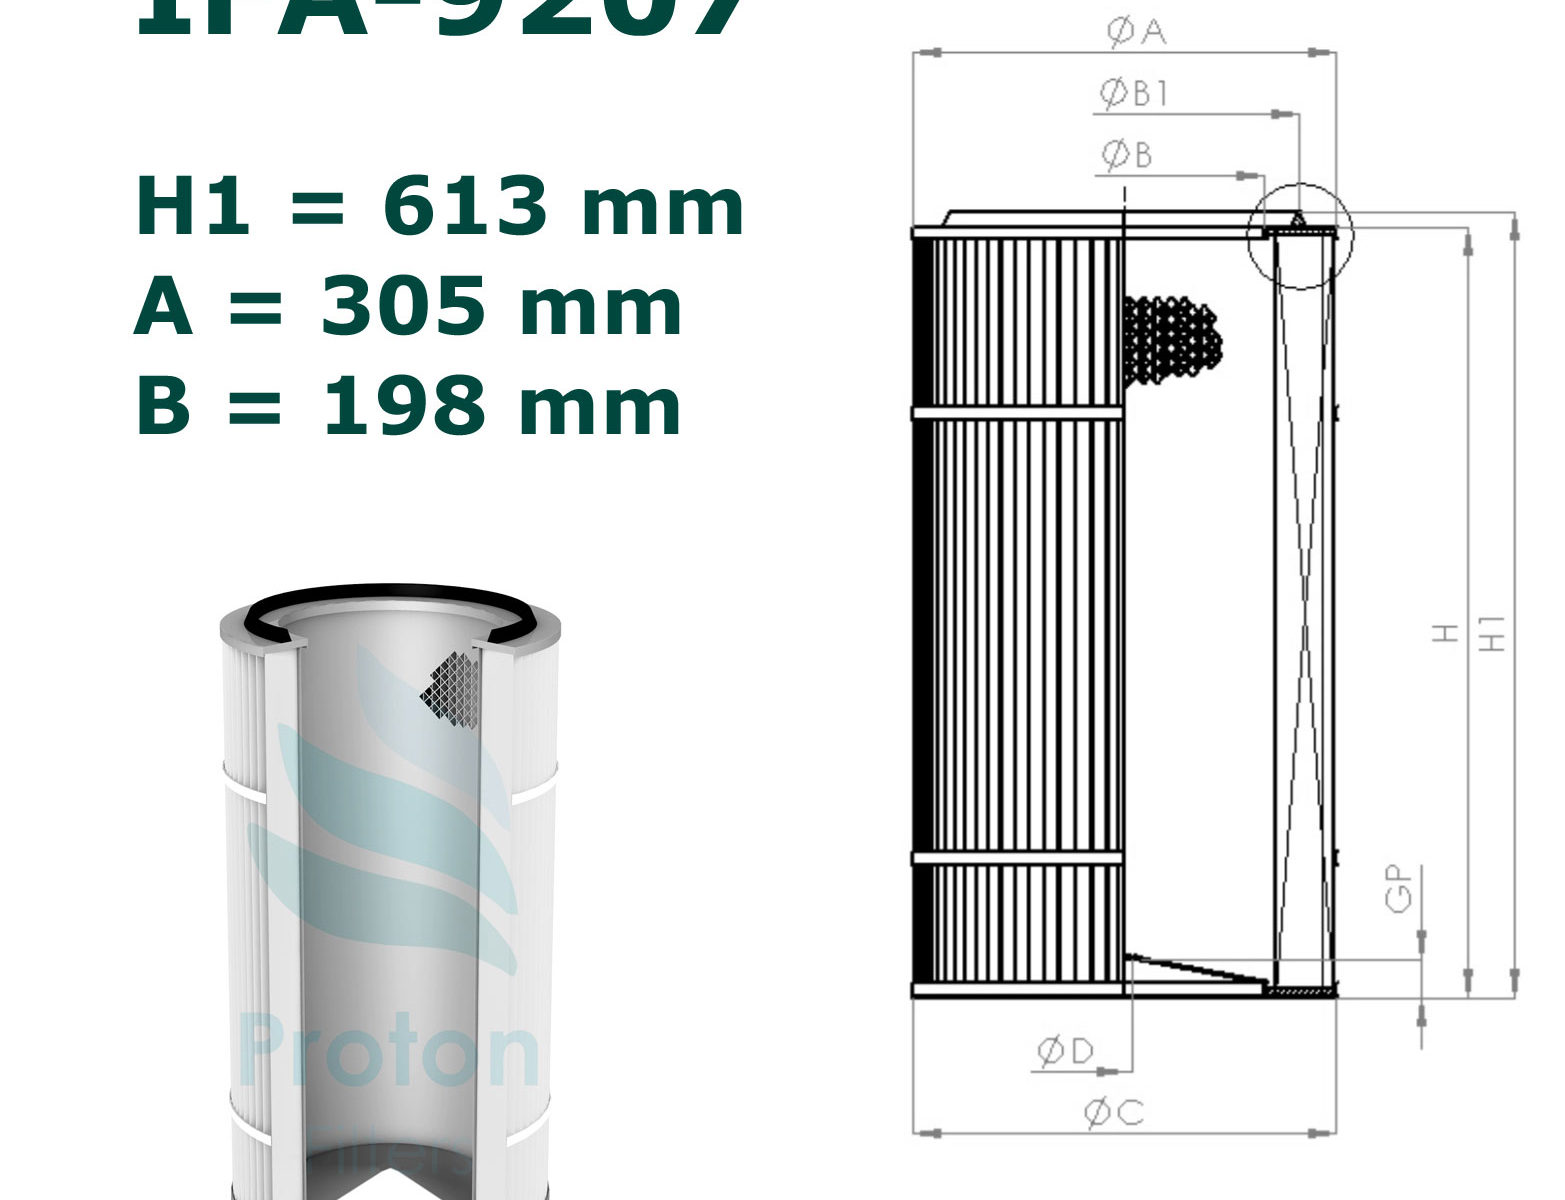 IFA-9207-1565x1200